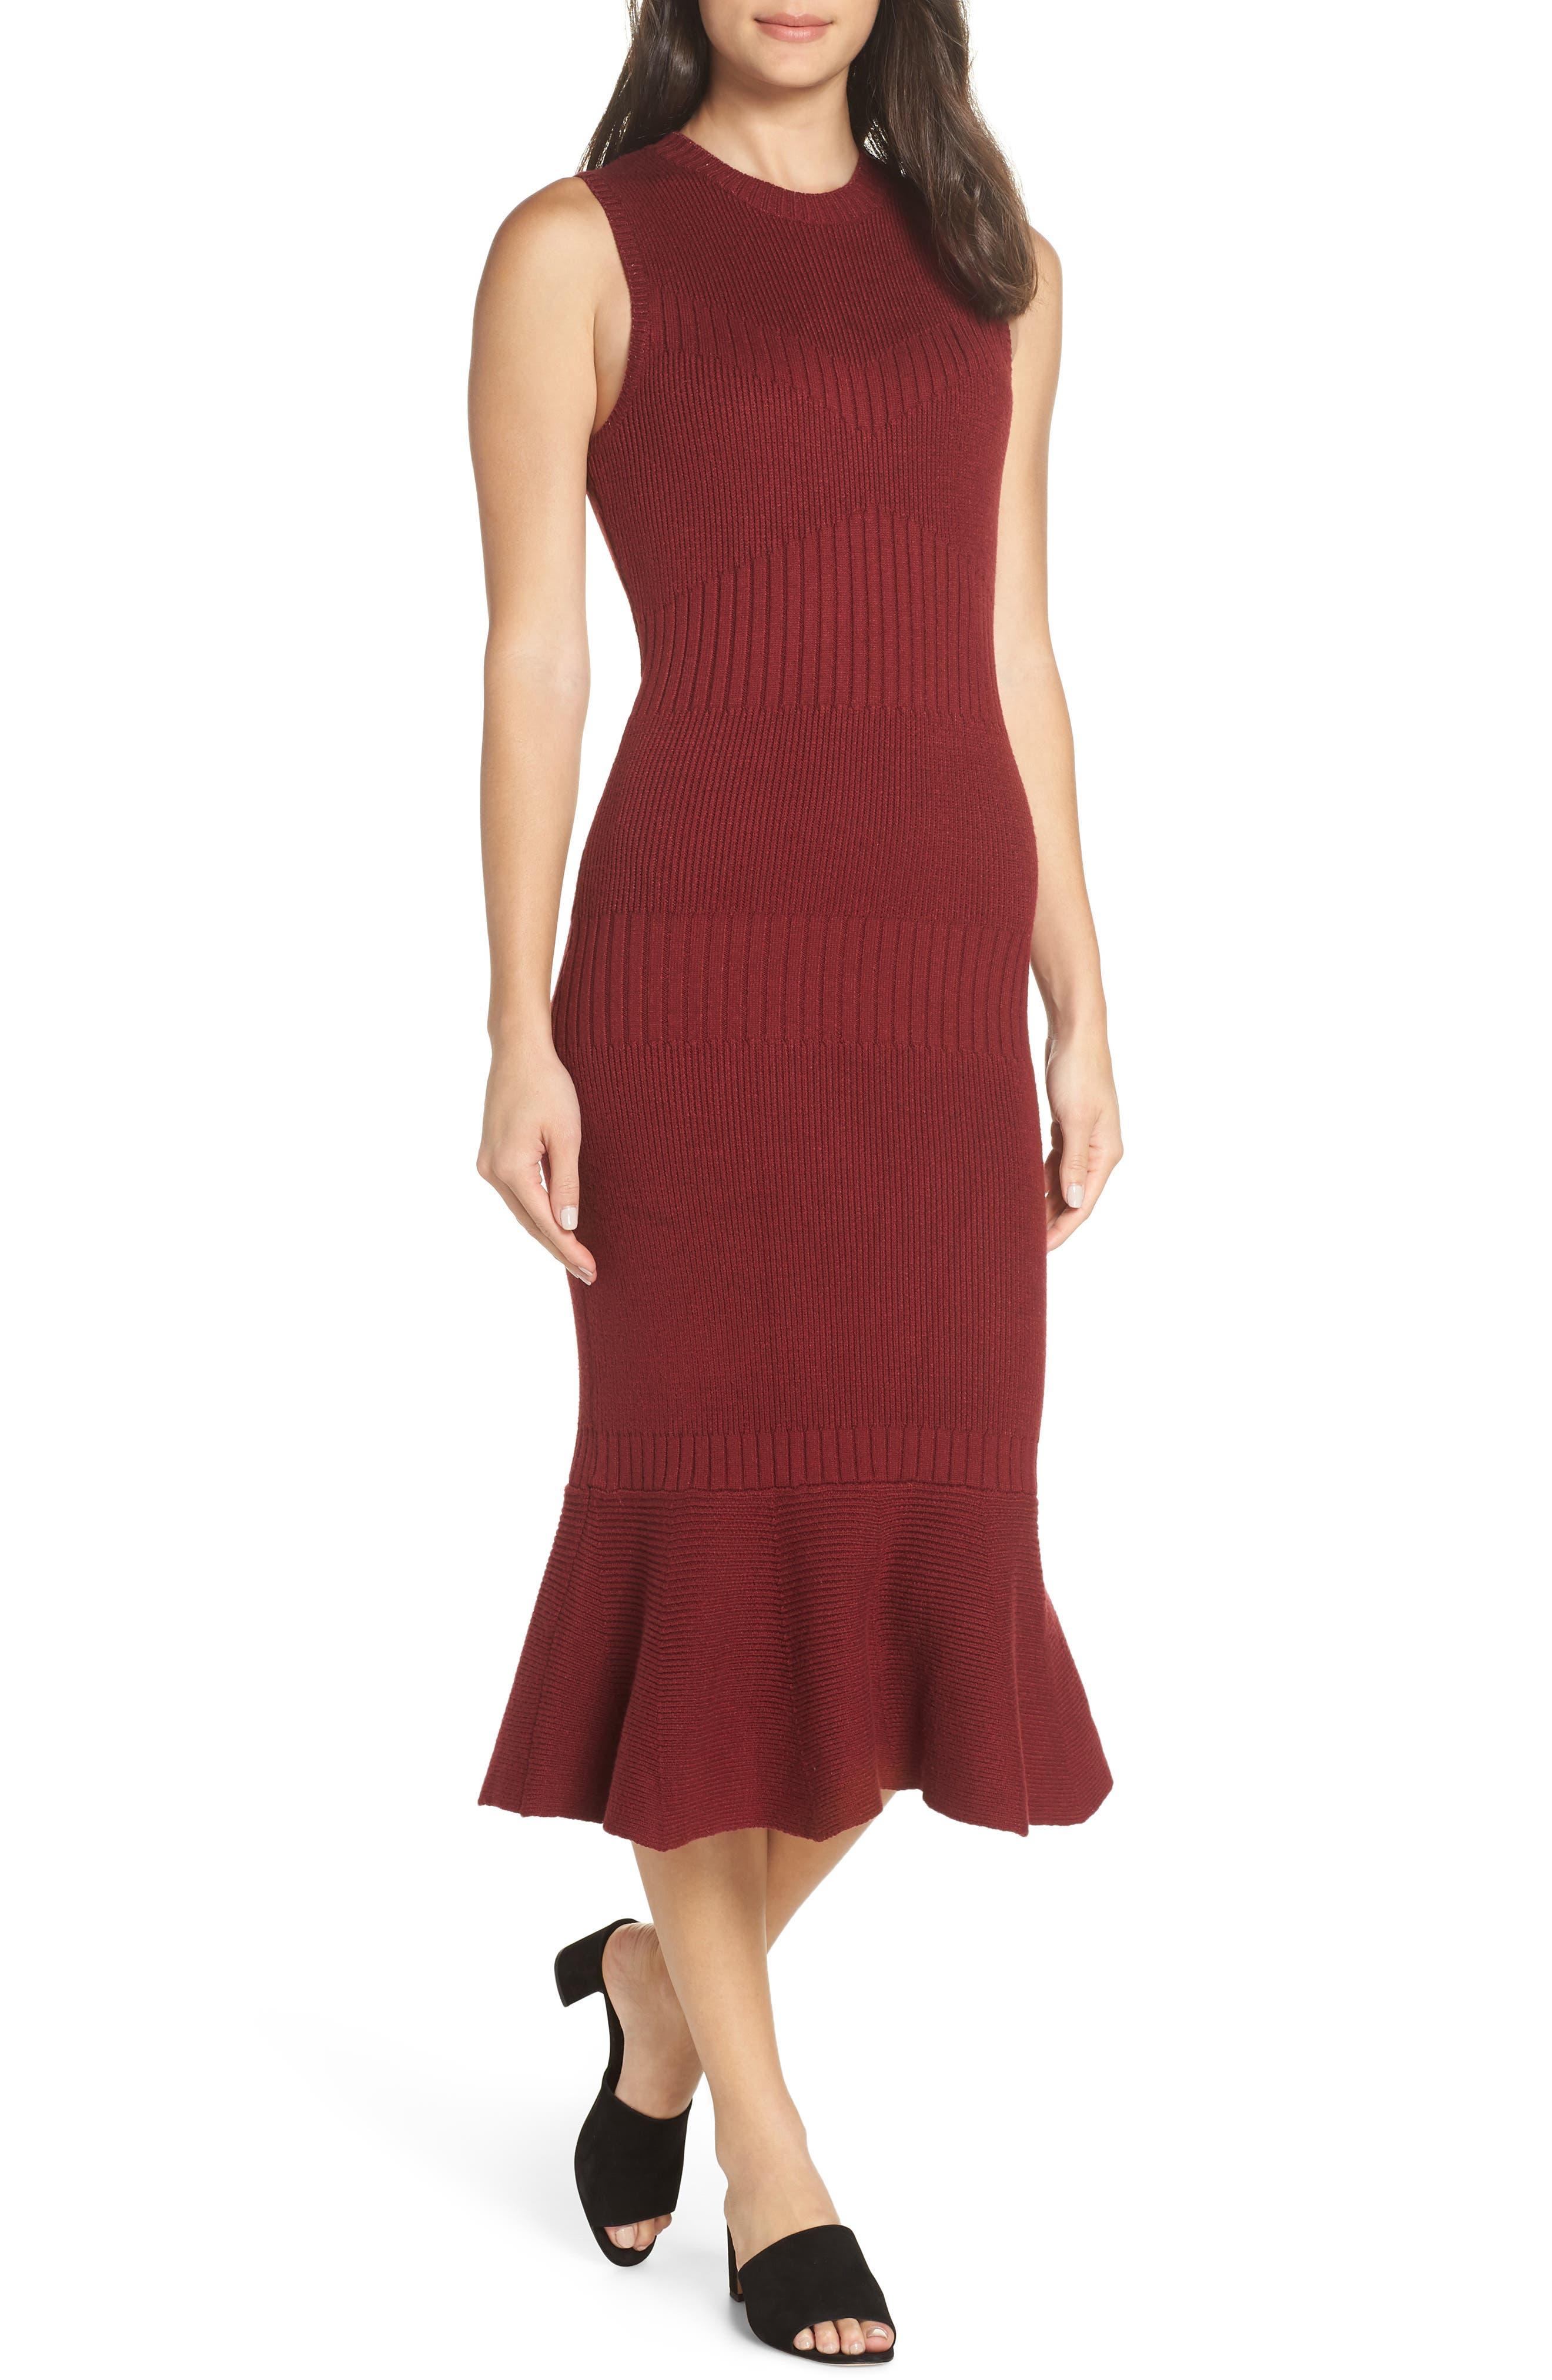 ADELYN RAE Inez Sweater Dress in Cabernet